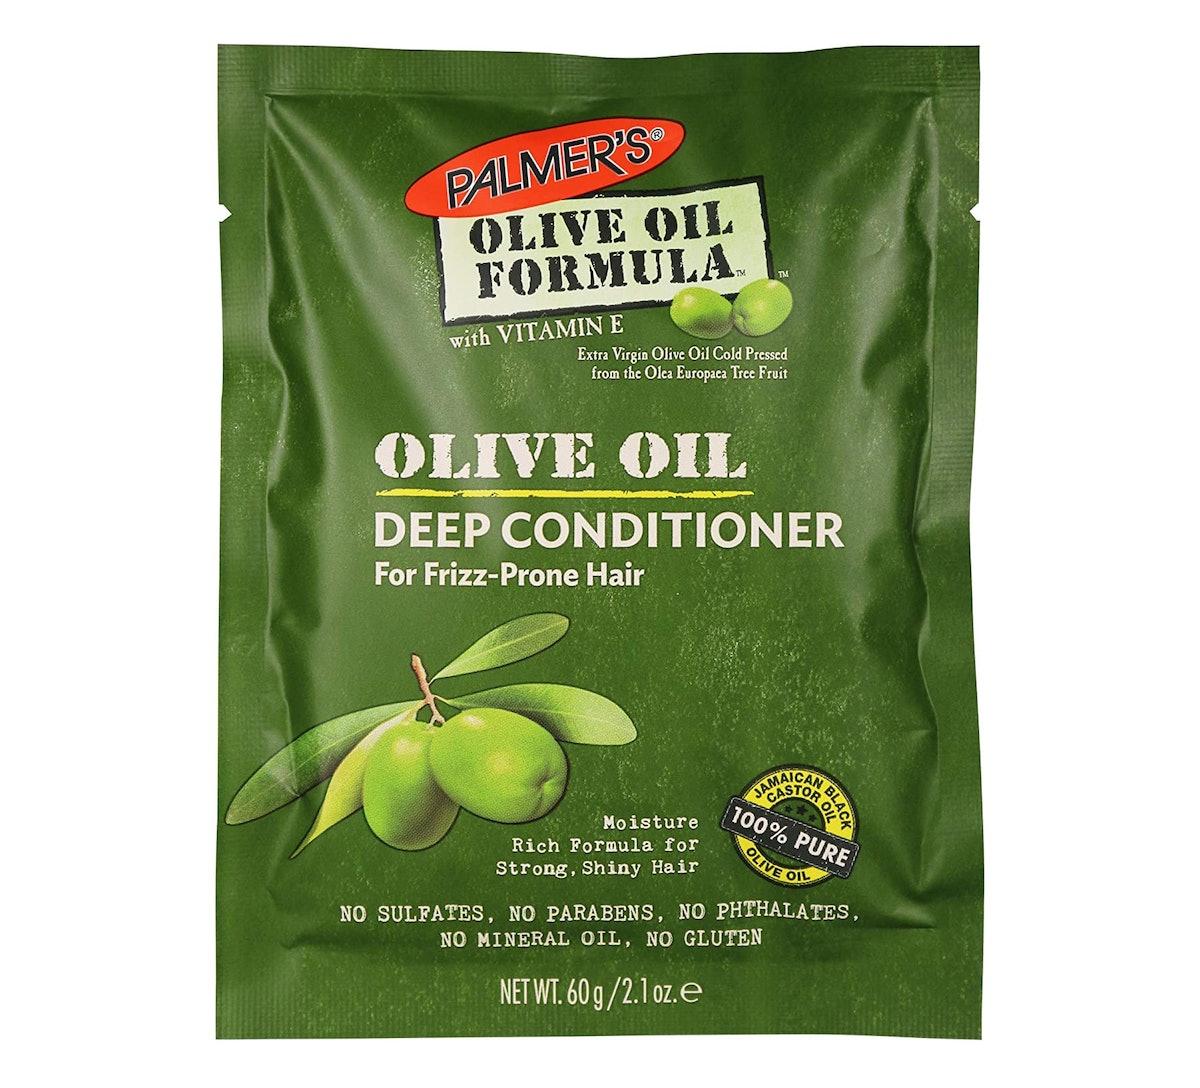 Palmer's Olive Oil Formula Deep Conditioner Packet